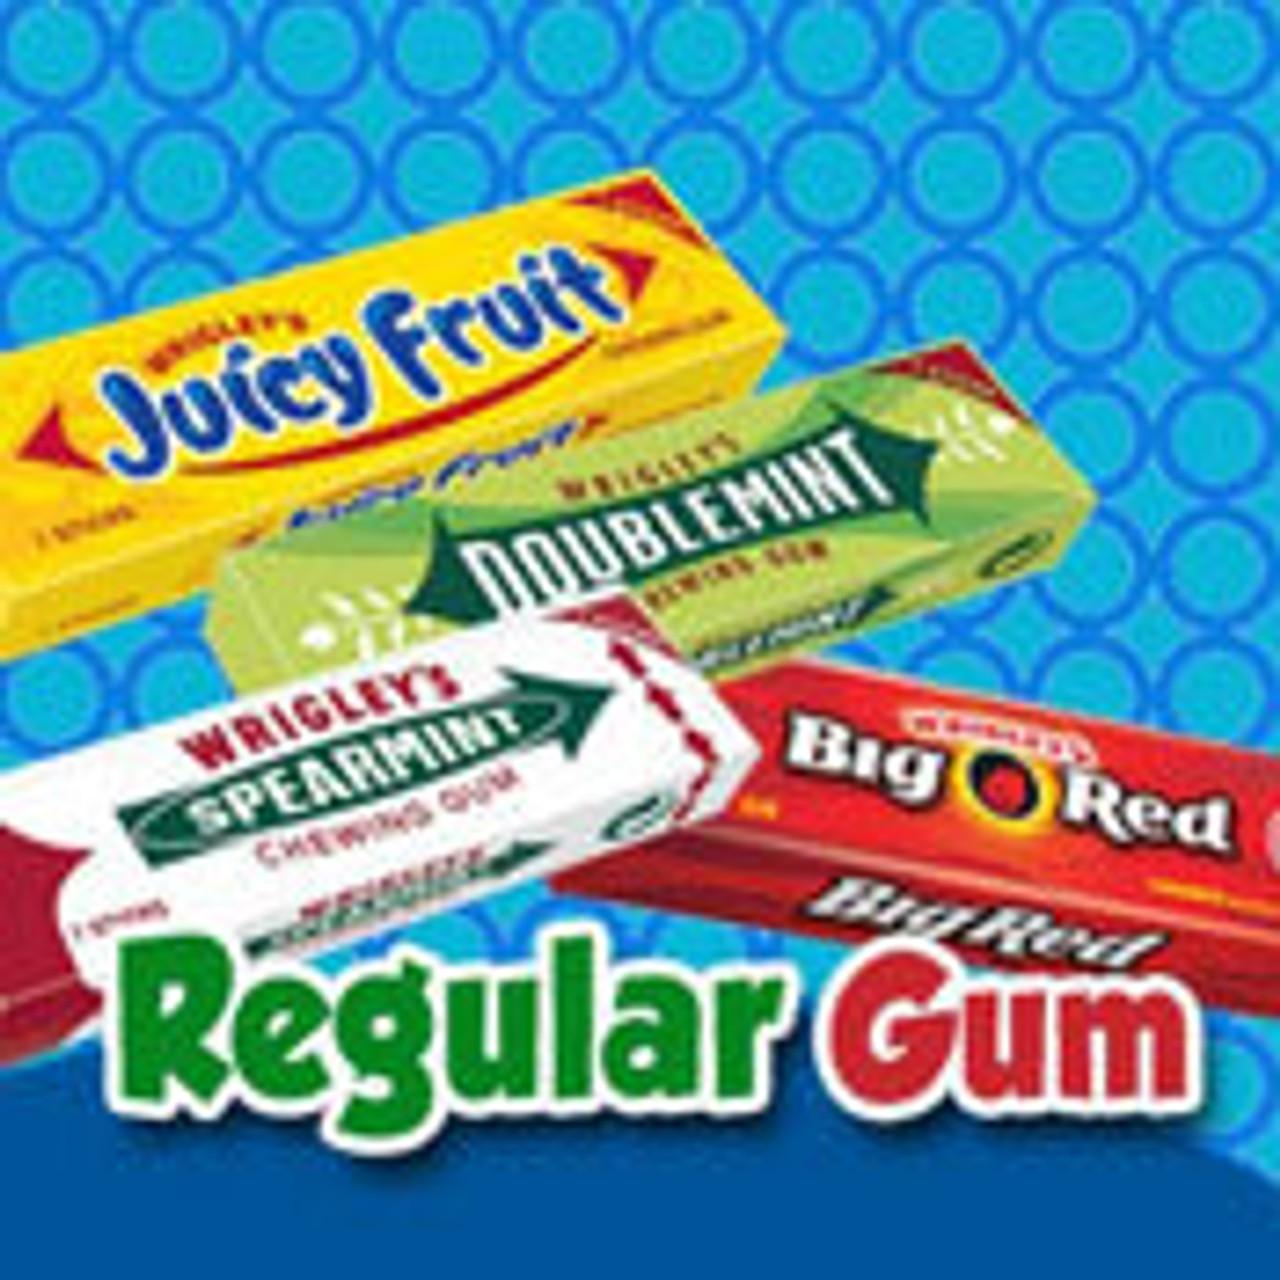 Regular Gum